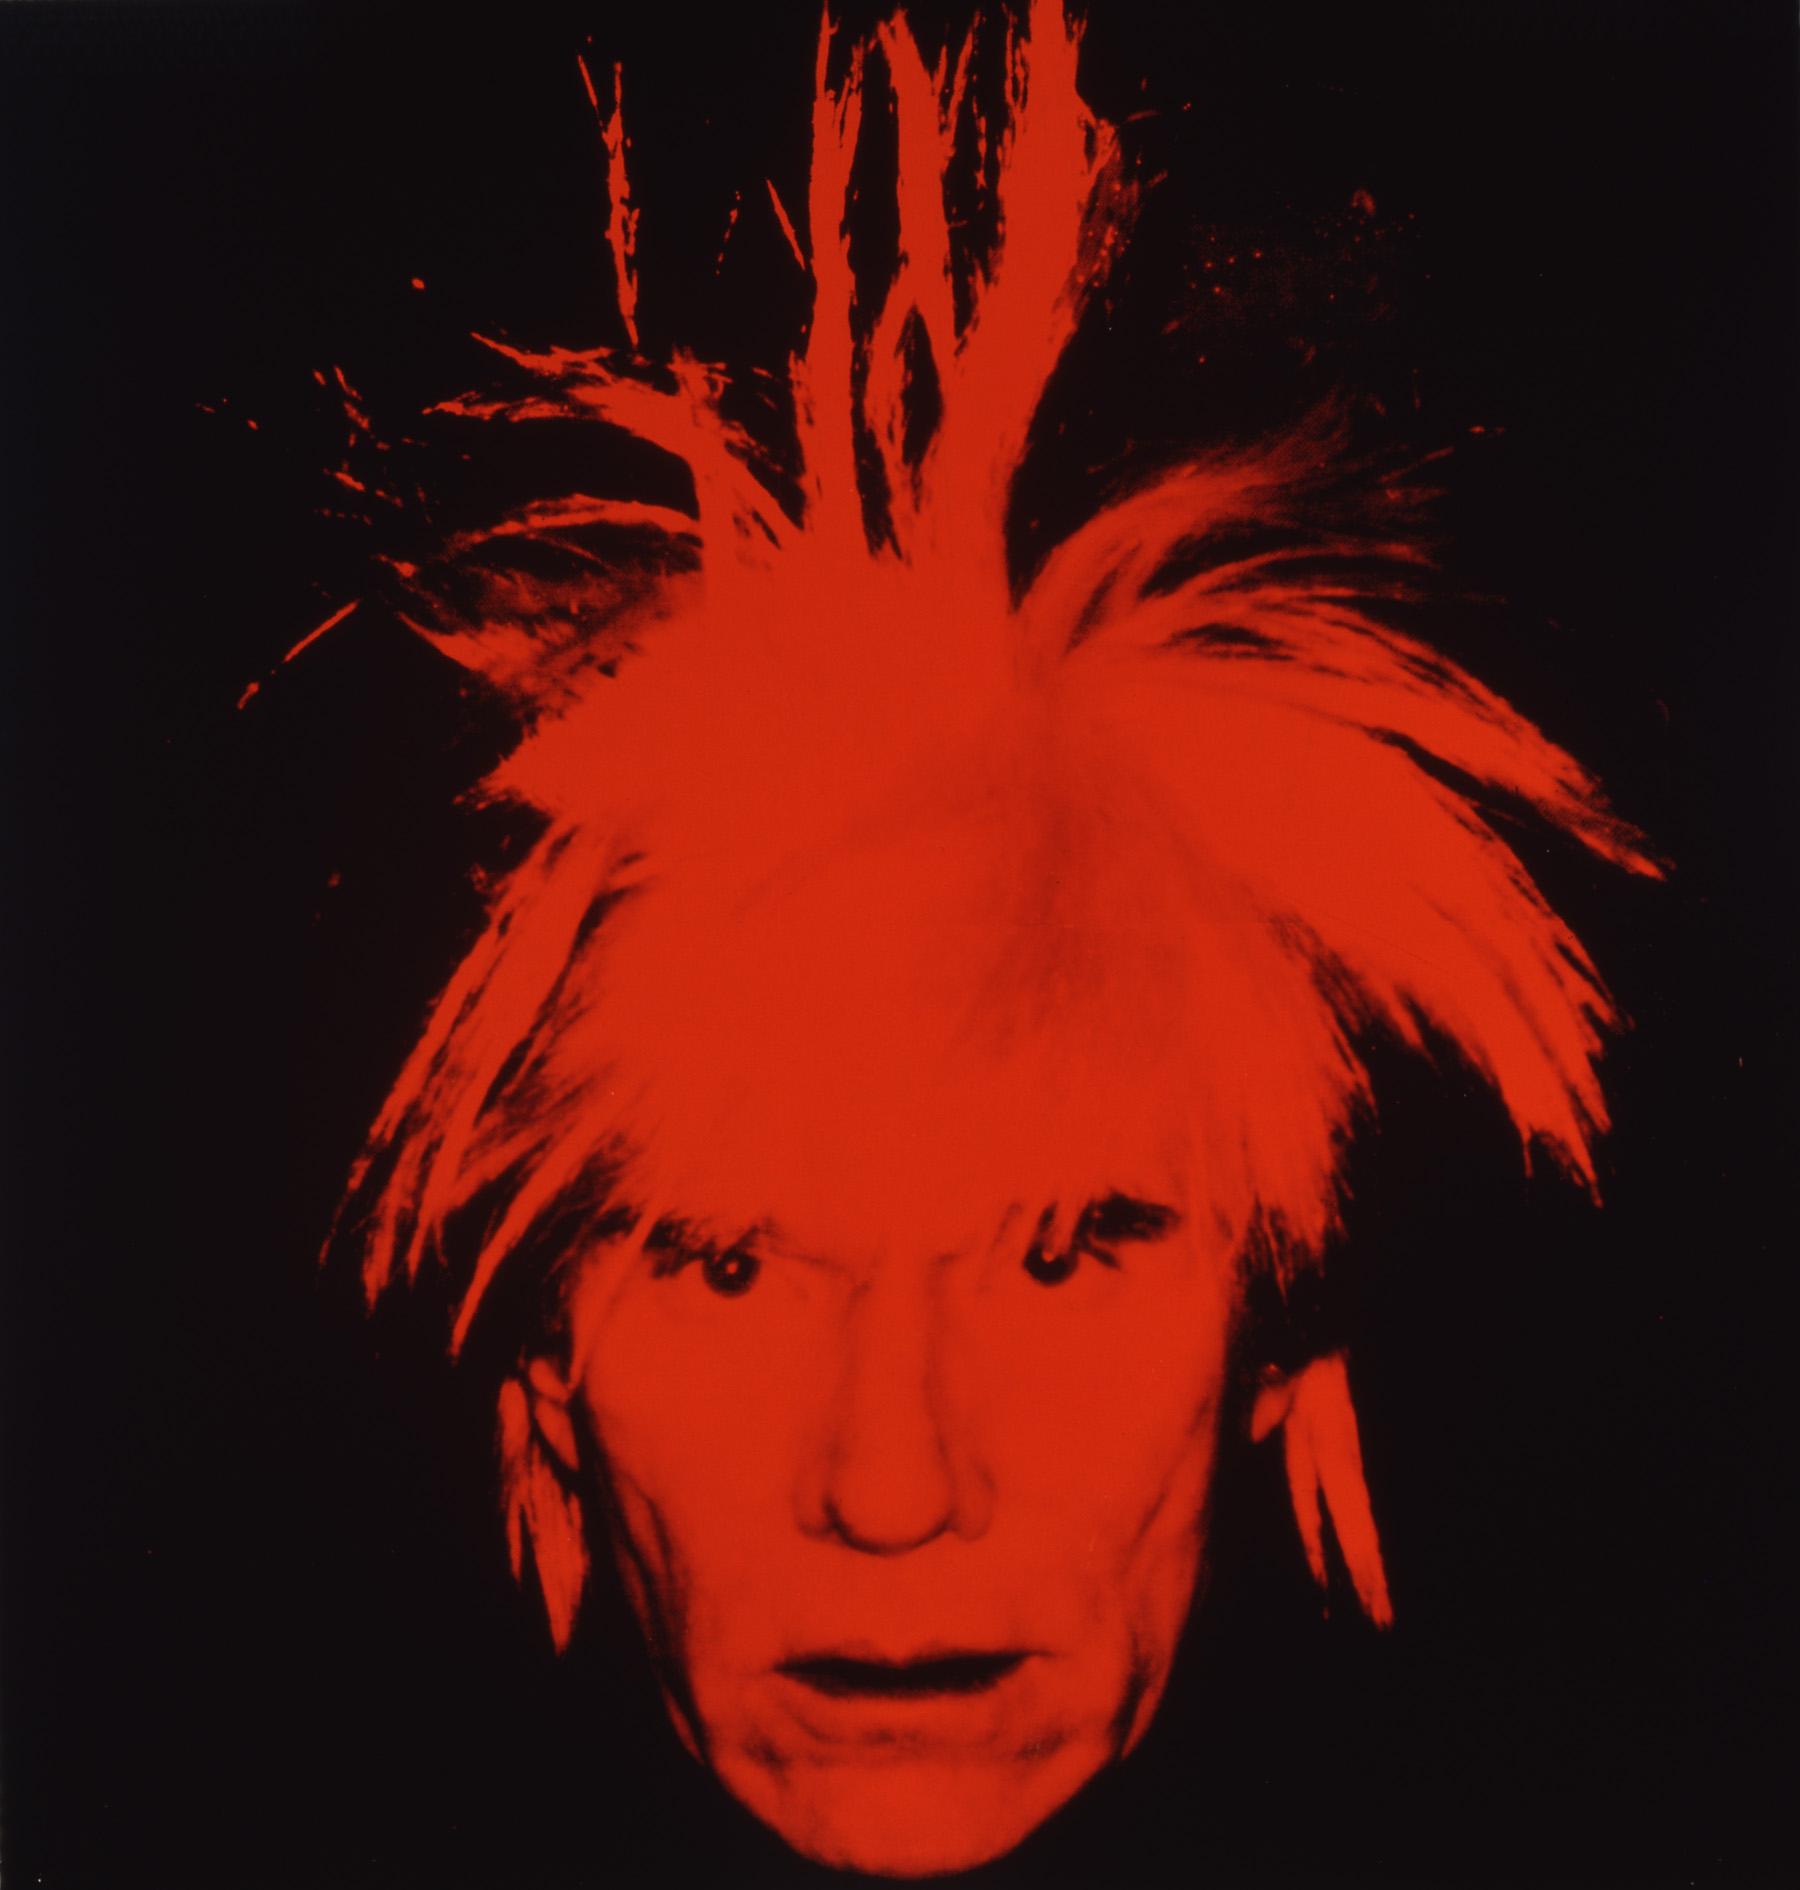 Andy Warhol, Self-Portrait, 1986, © AWF